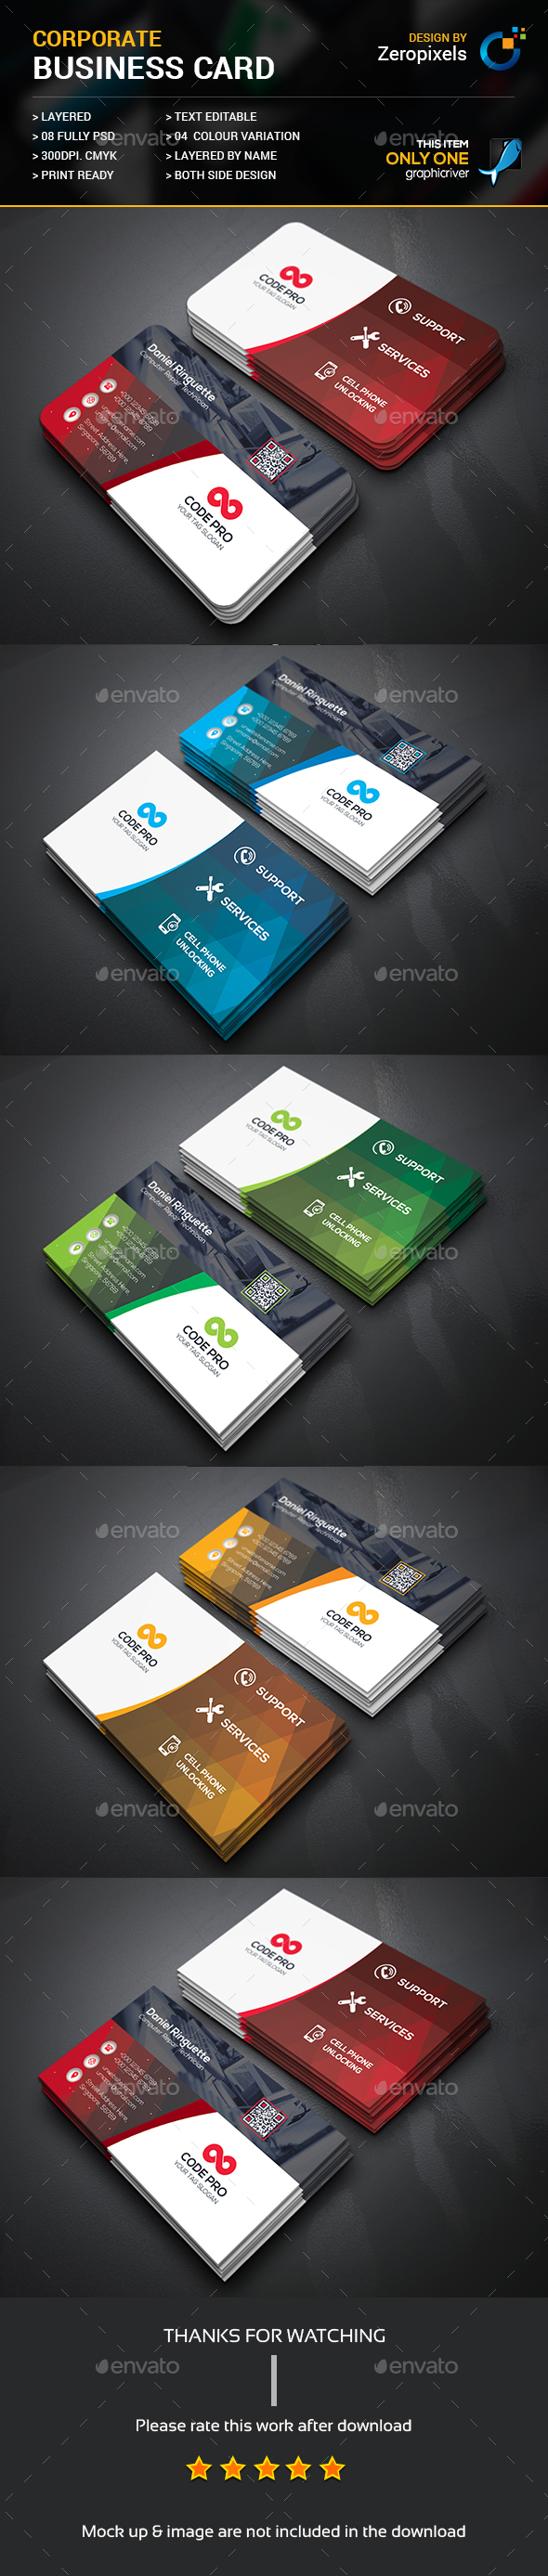 Mobile Computer Repair Business Card — Photoshop PSD #blue #print ...